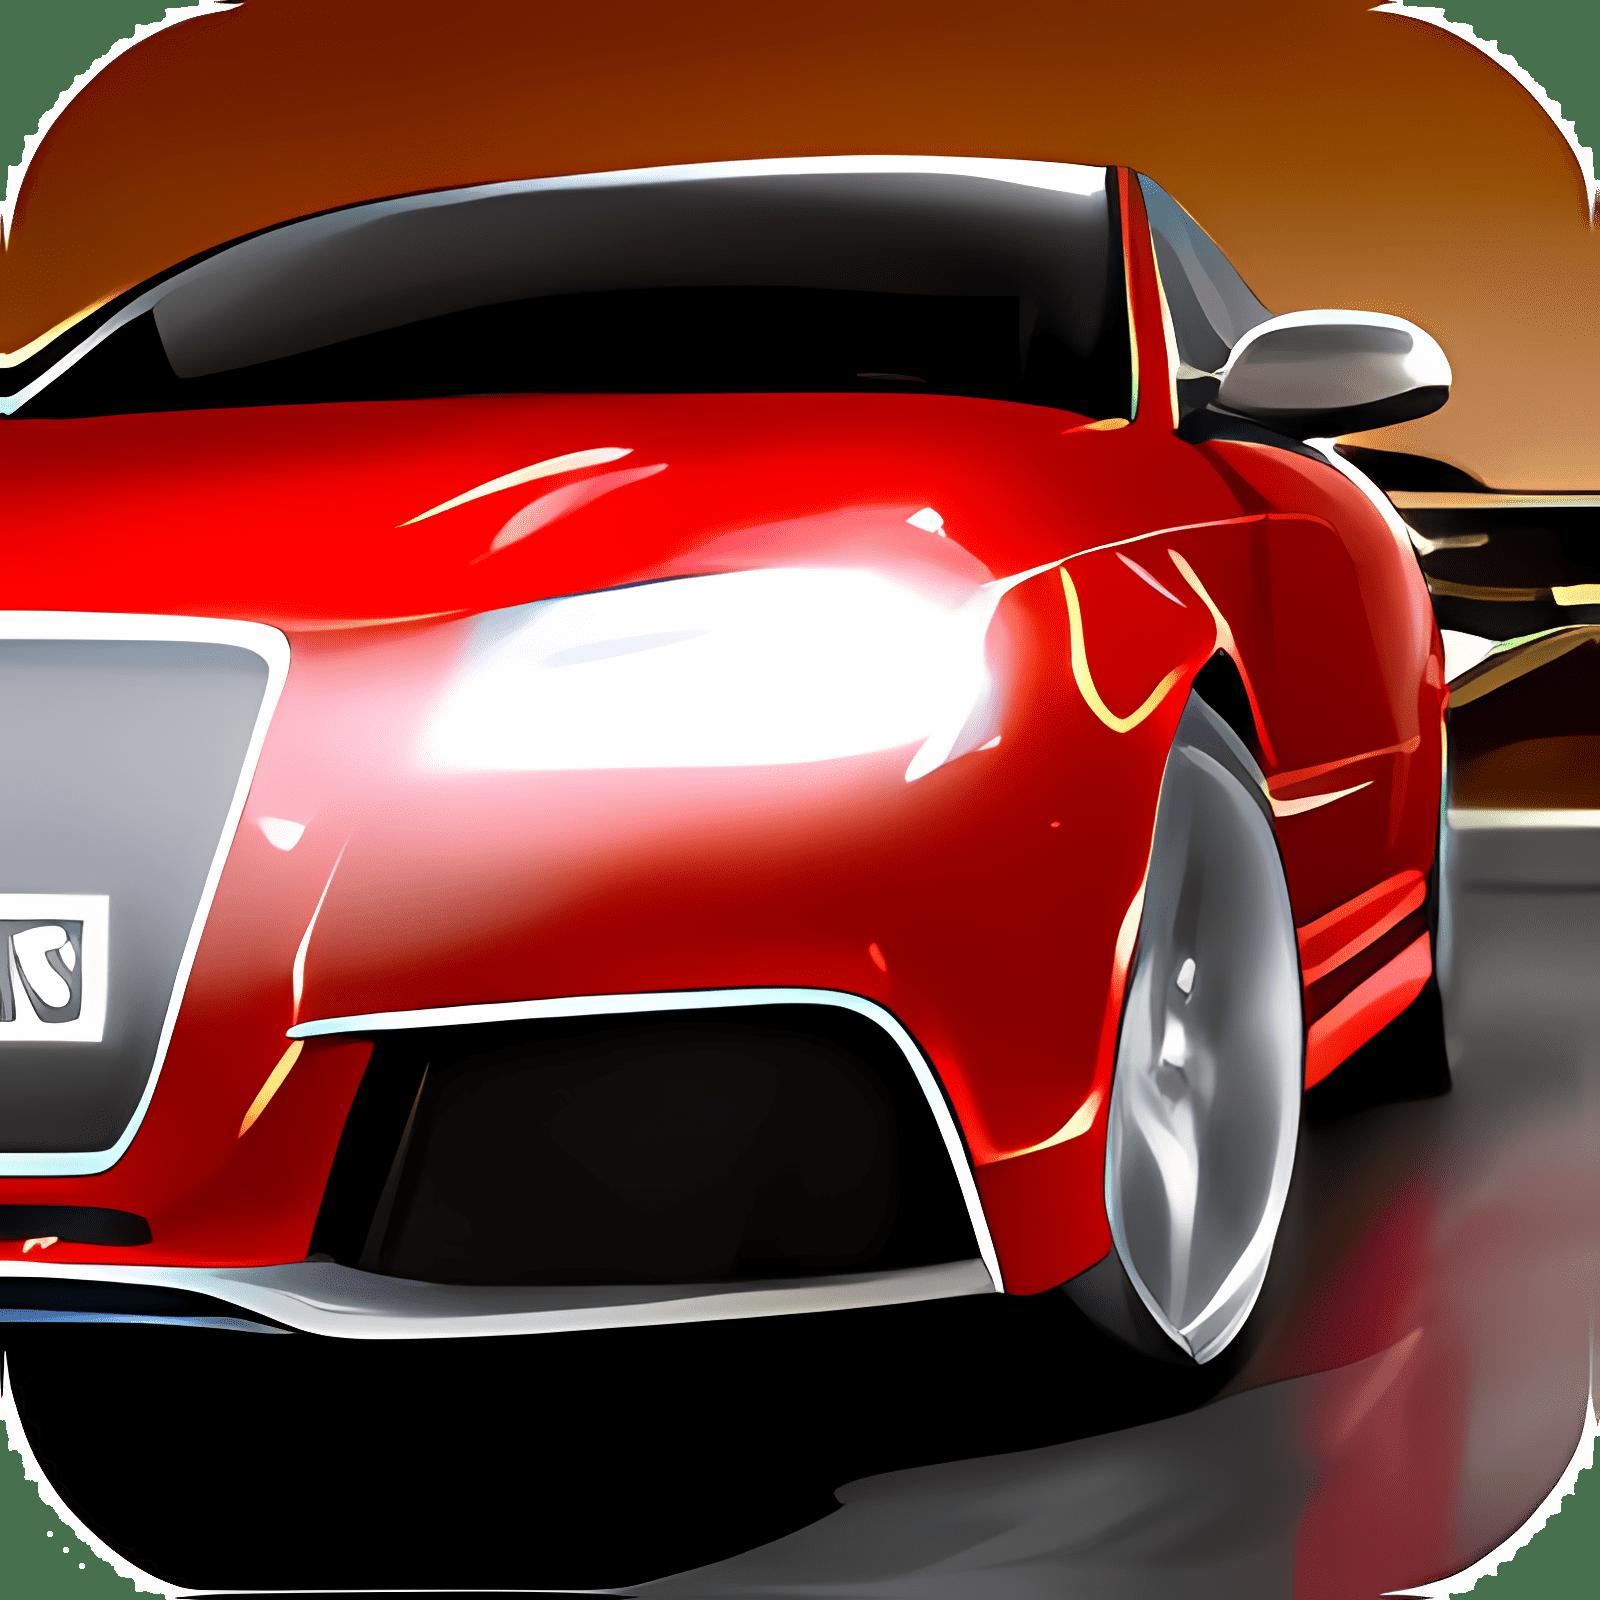 Asphalt Audi RS 3